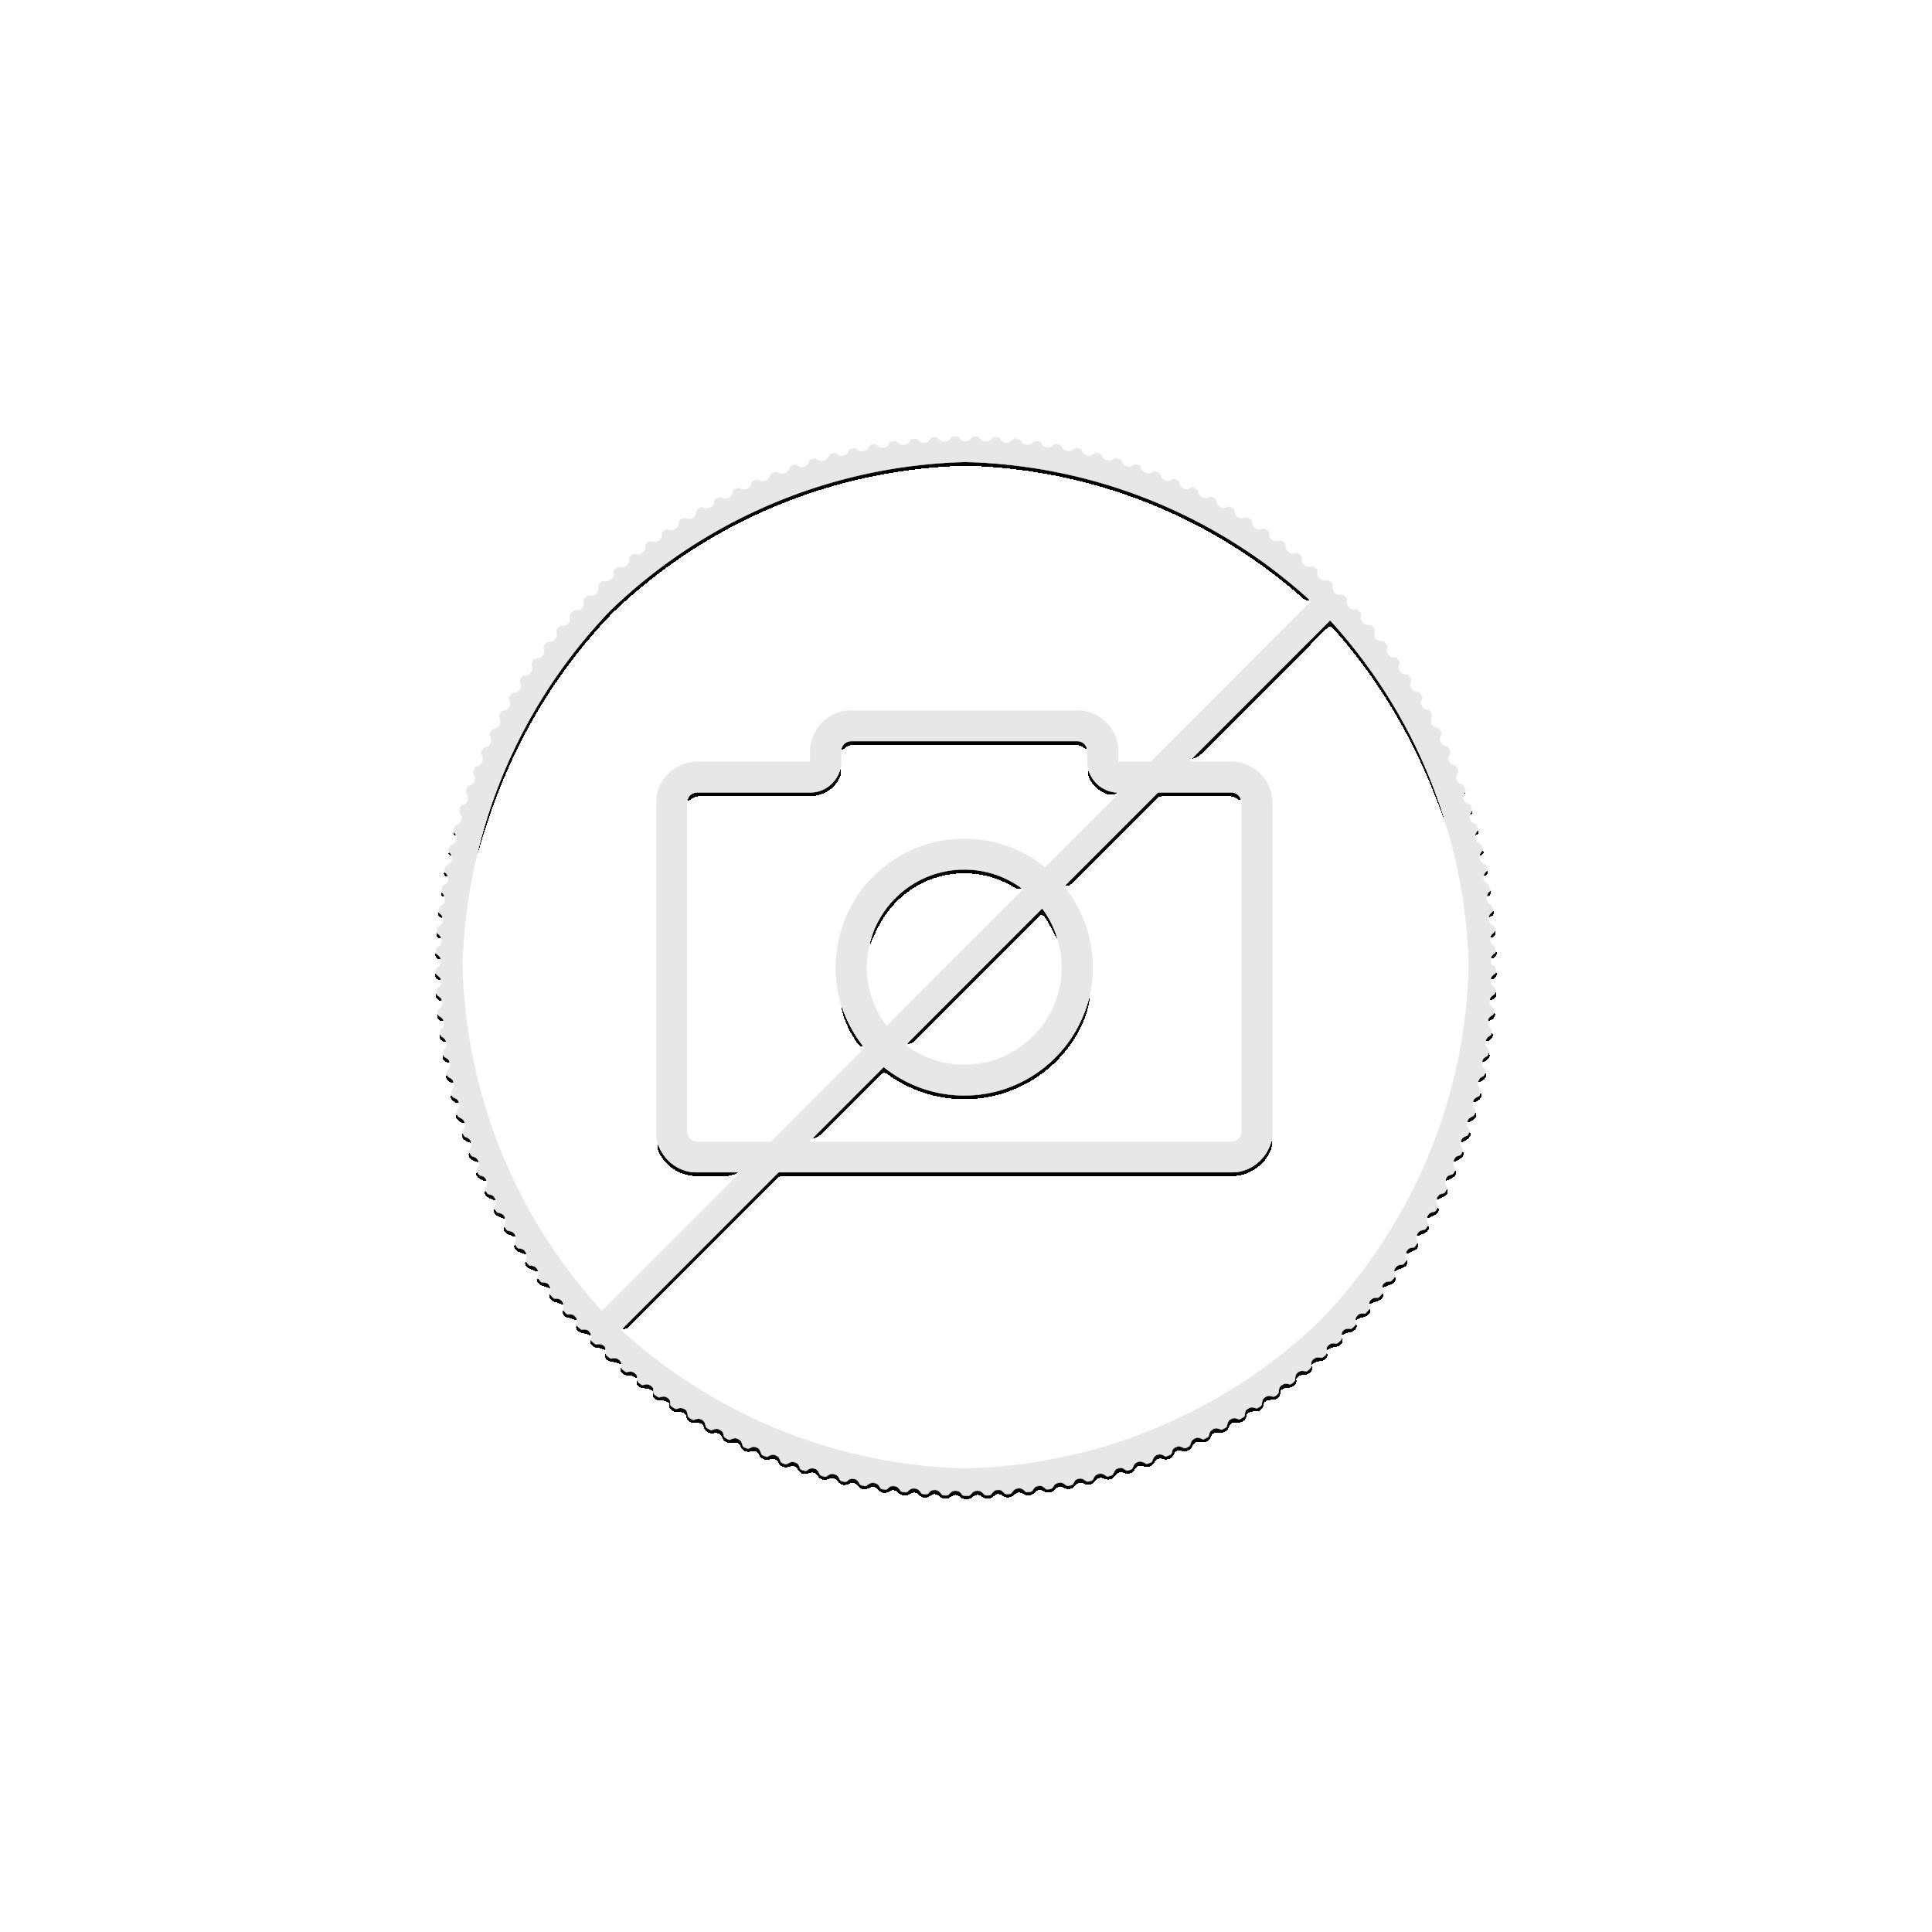 1 kilo Lunar silver coin 2013